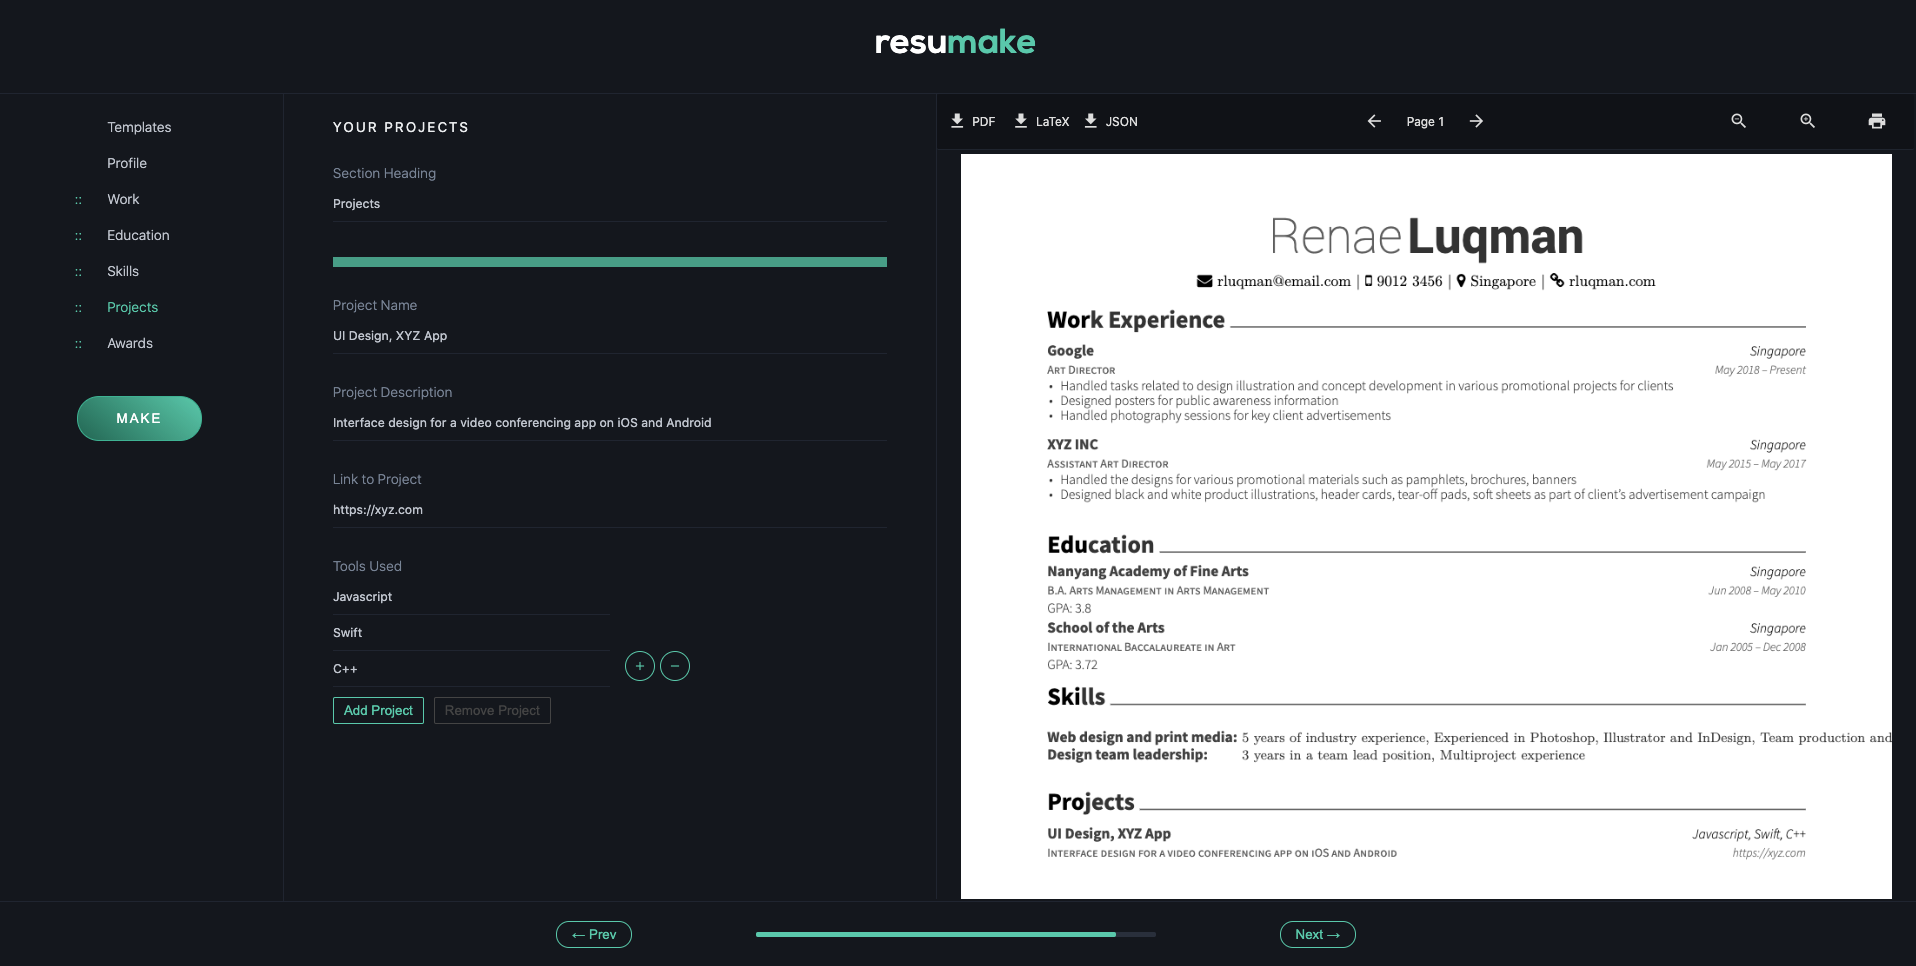 resume builder singapore - nine professional templates